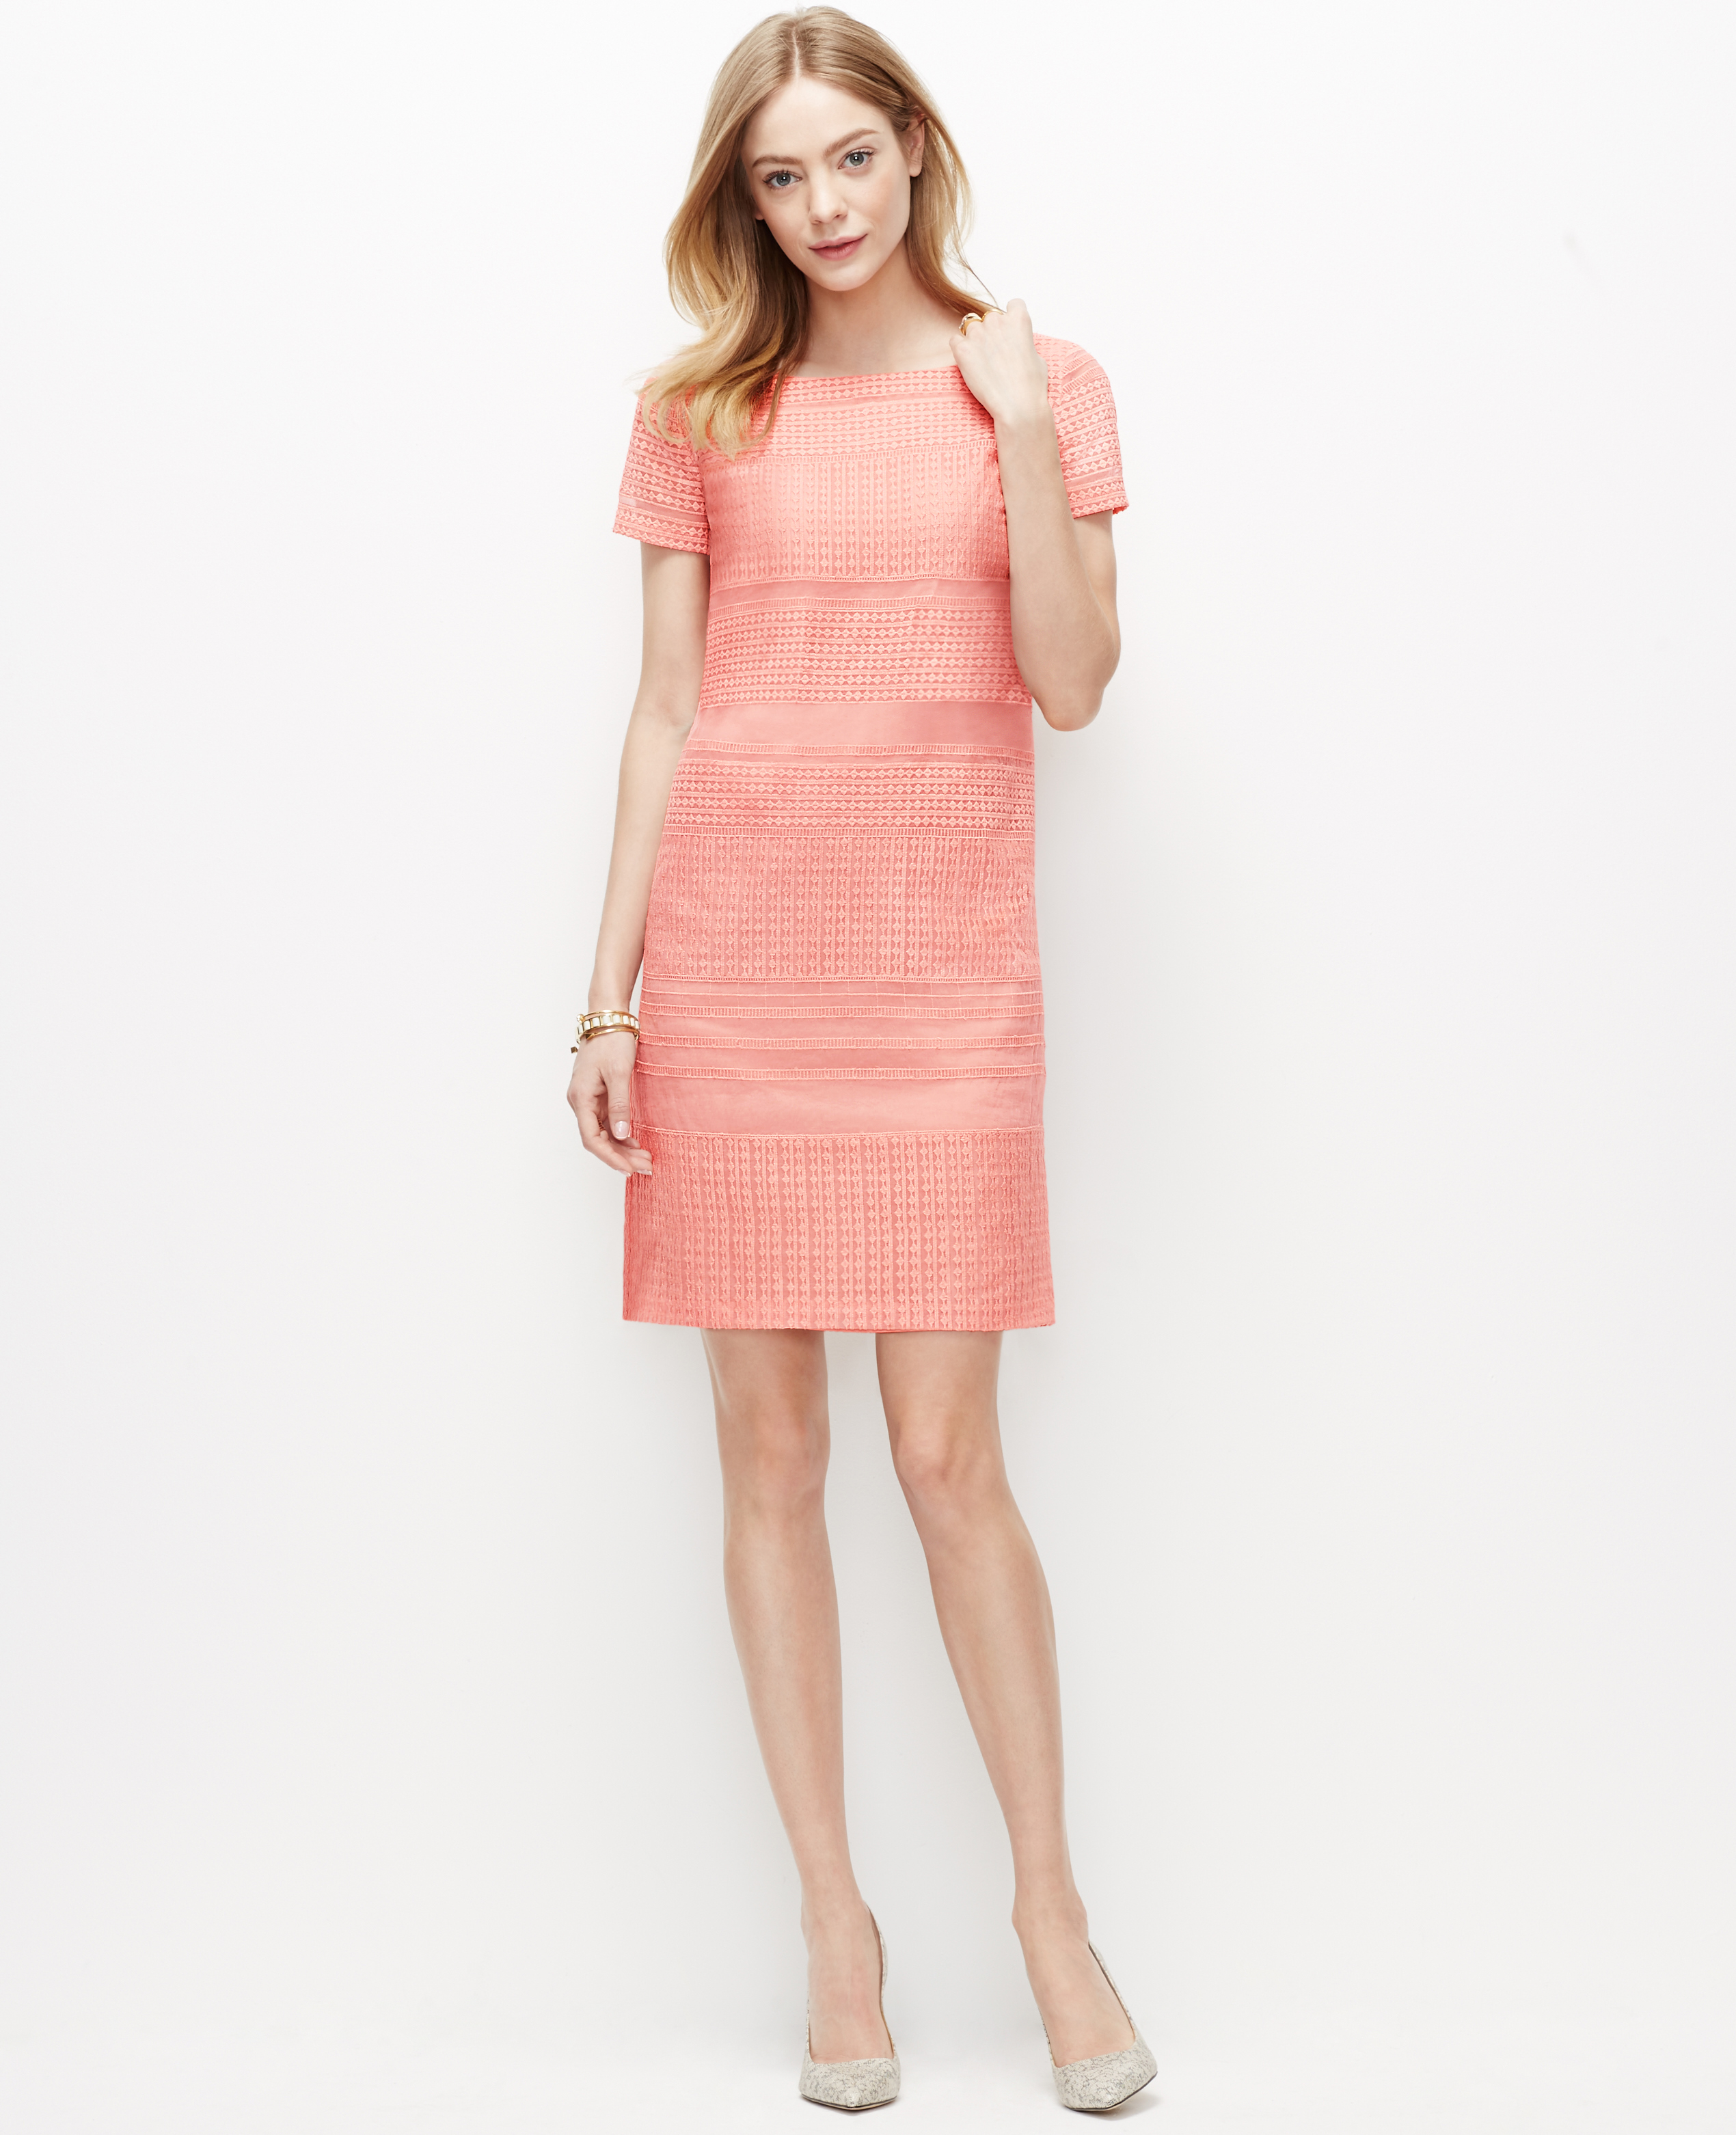 Lyst - Ann Taylor Petite Organza Lace Shift Dress in Pink